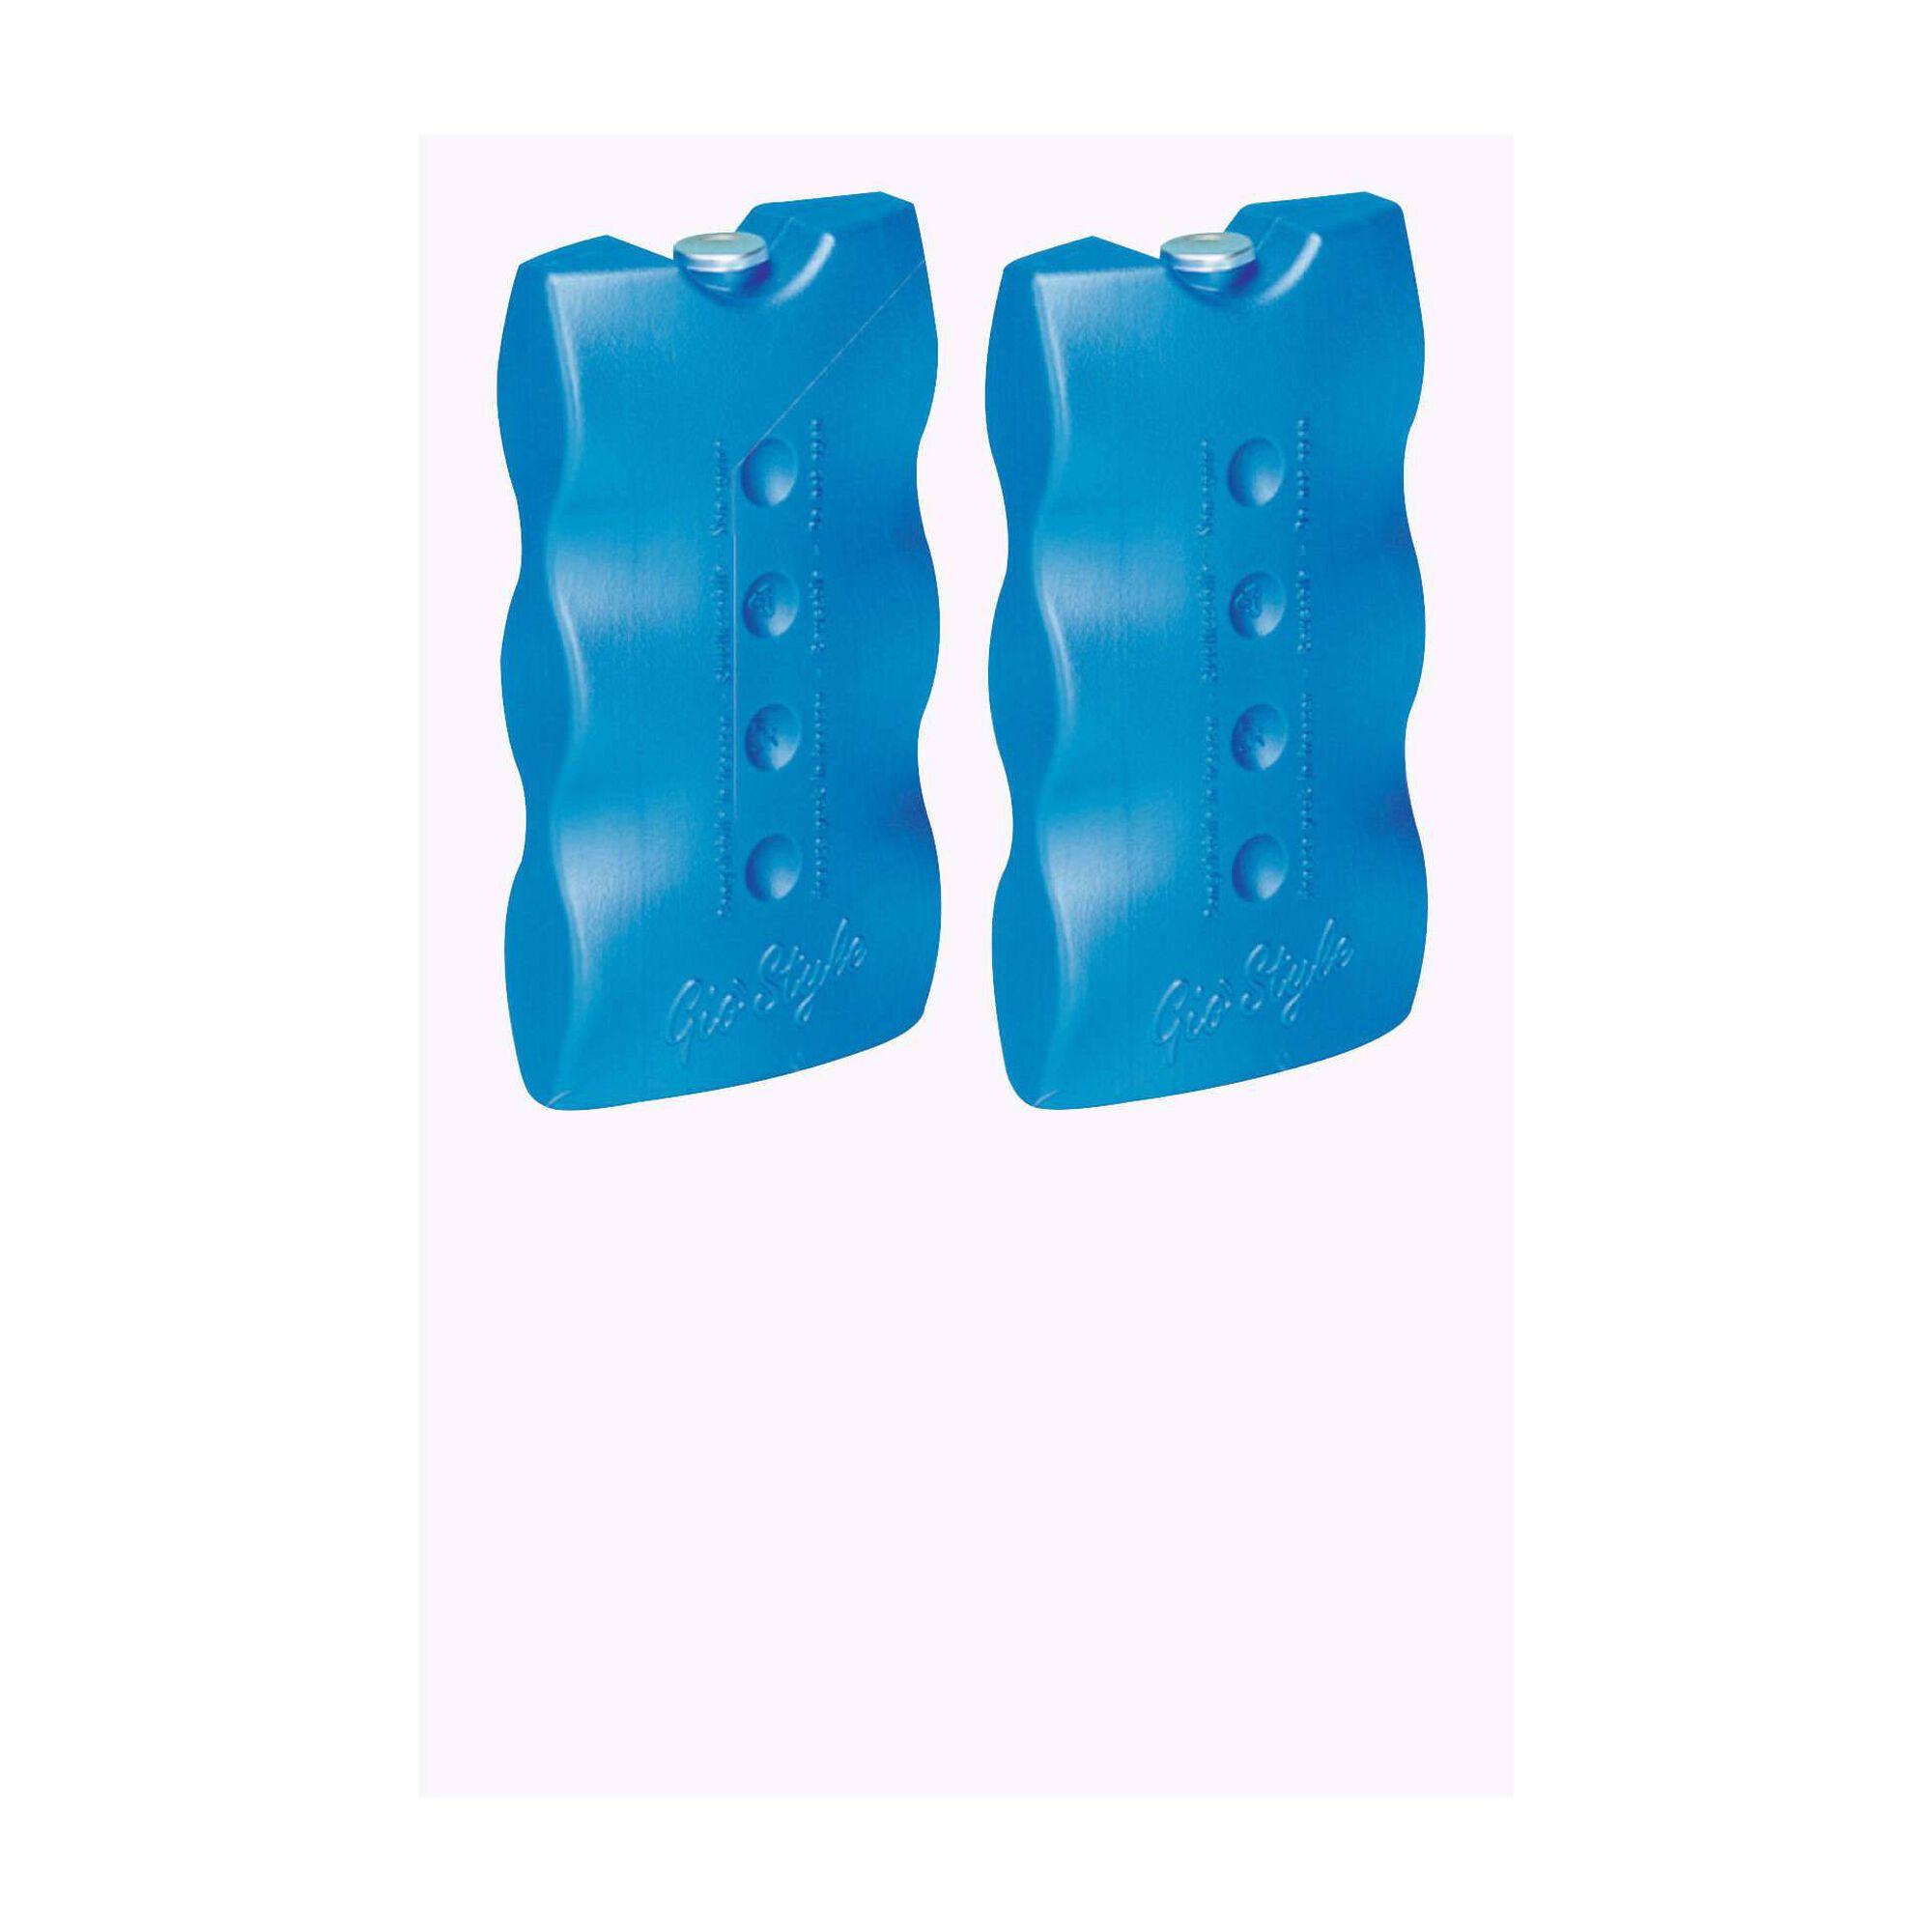 Termoacumulador Azul Giostyle